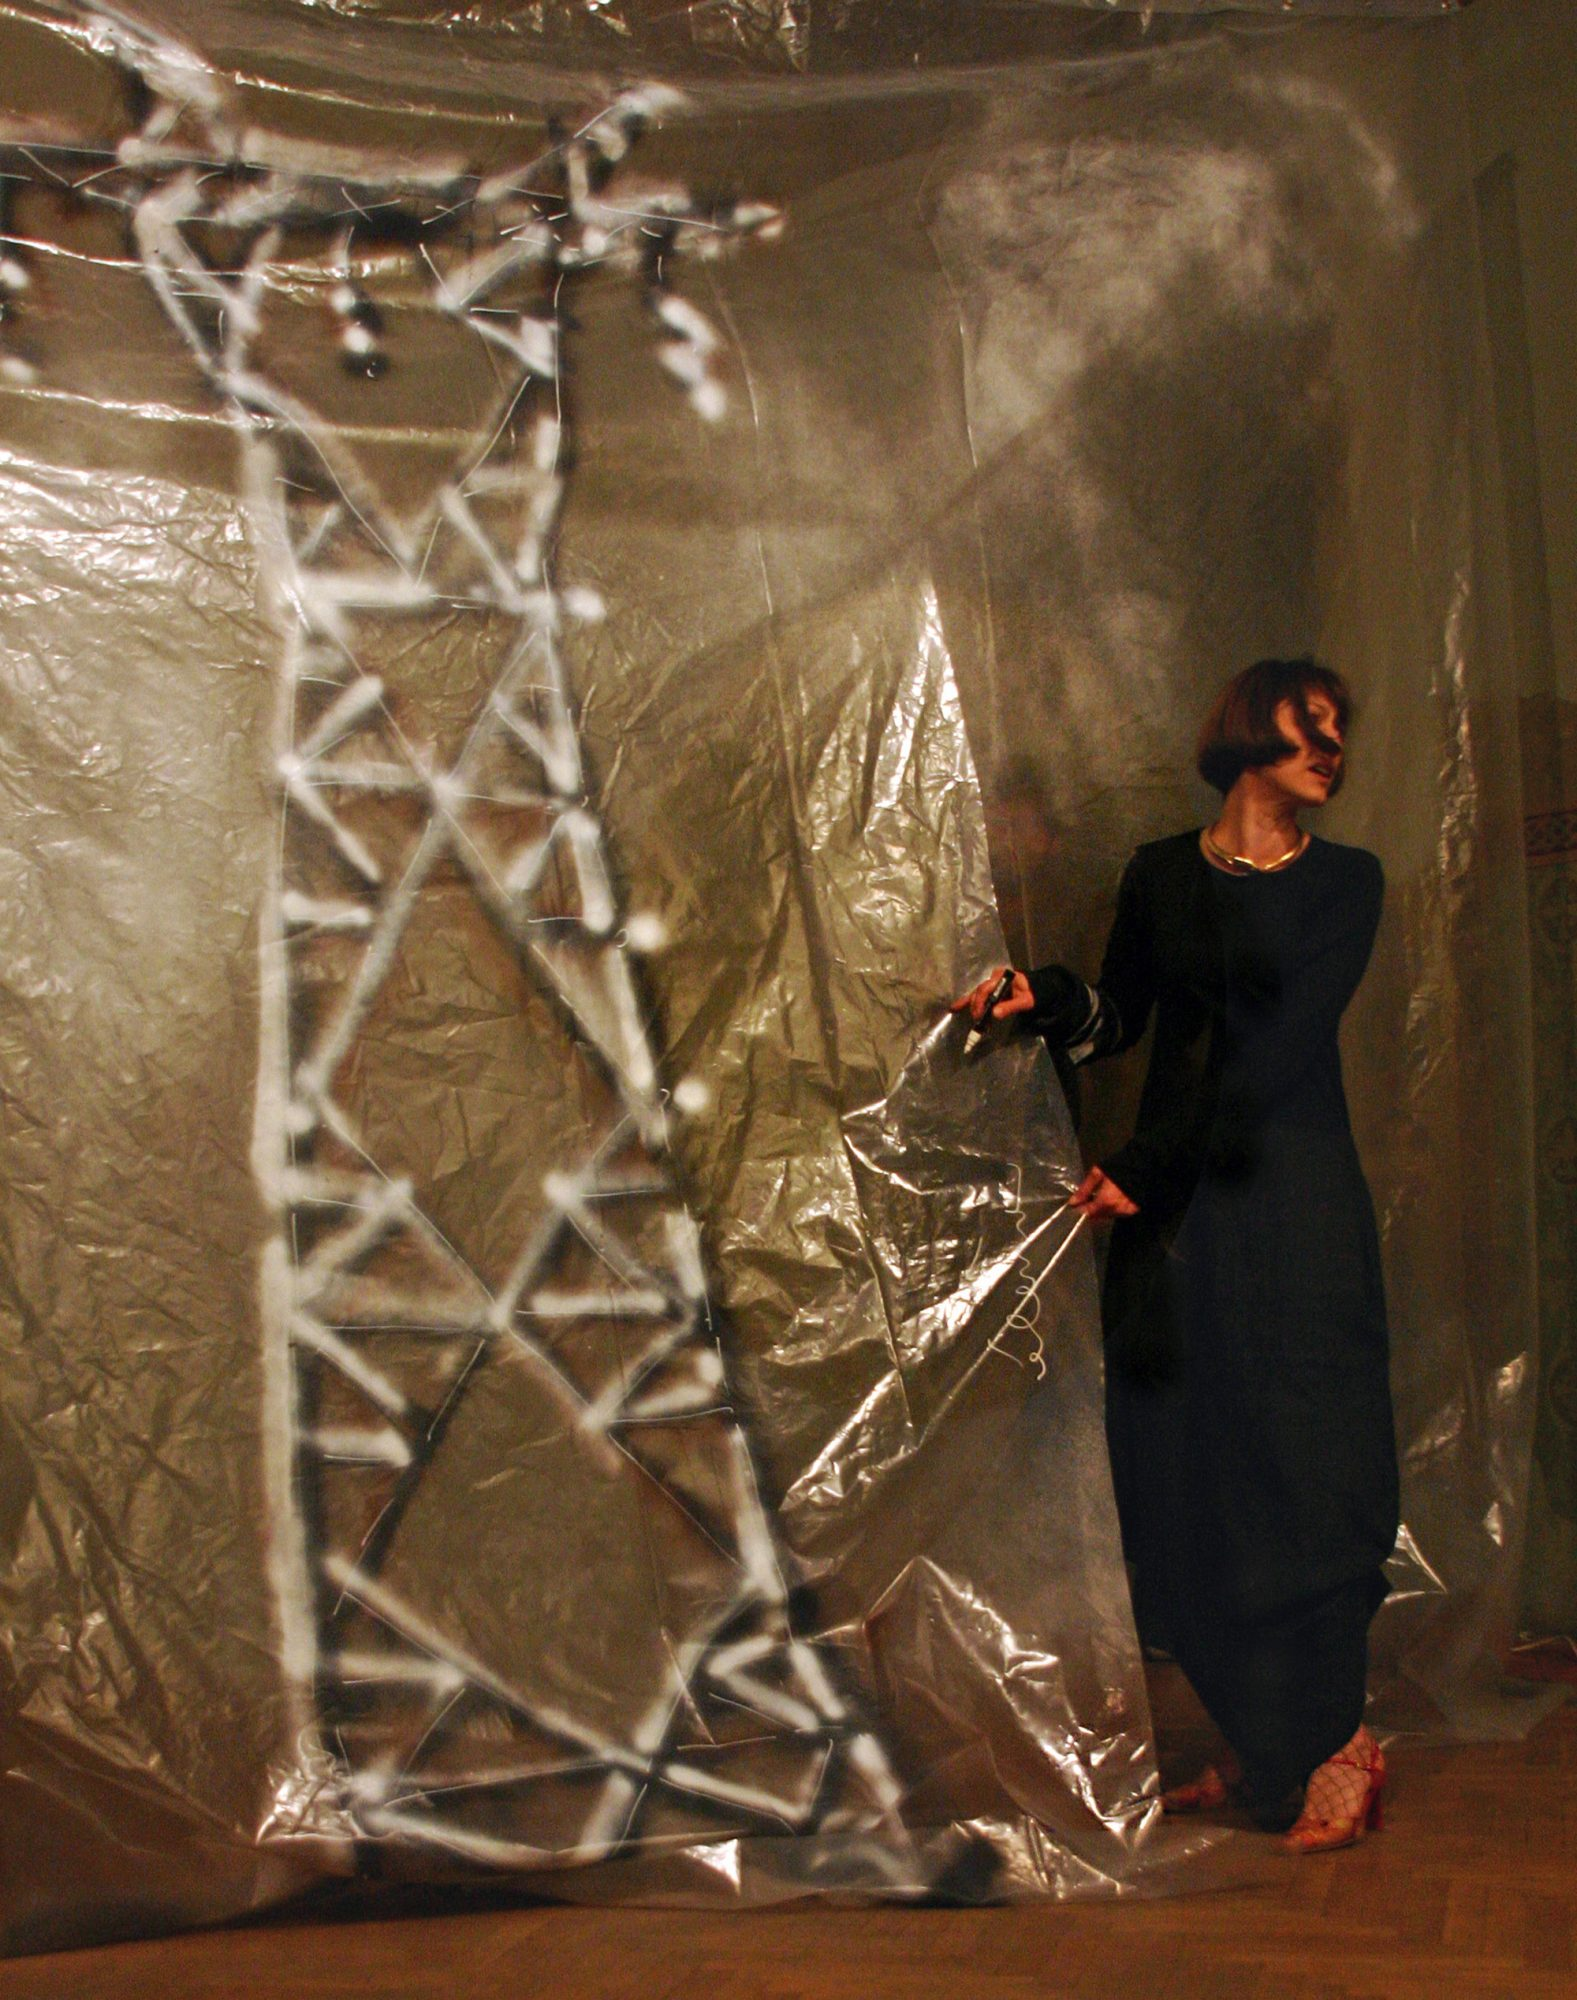 Electric Art performance, Sofia, 2005